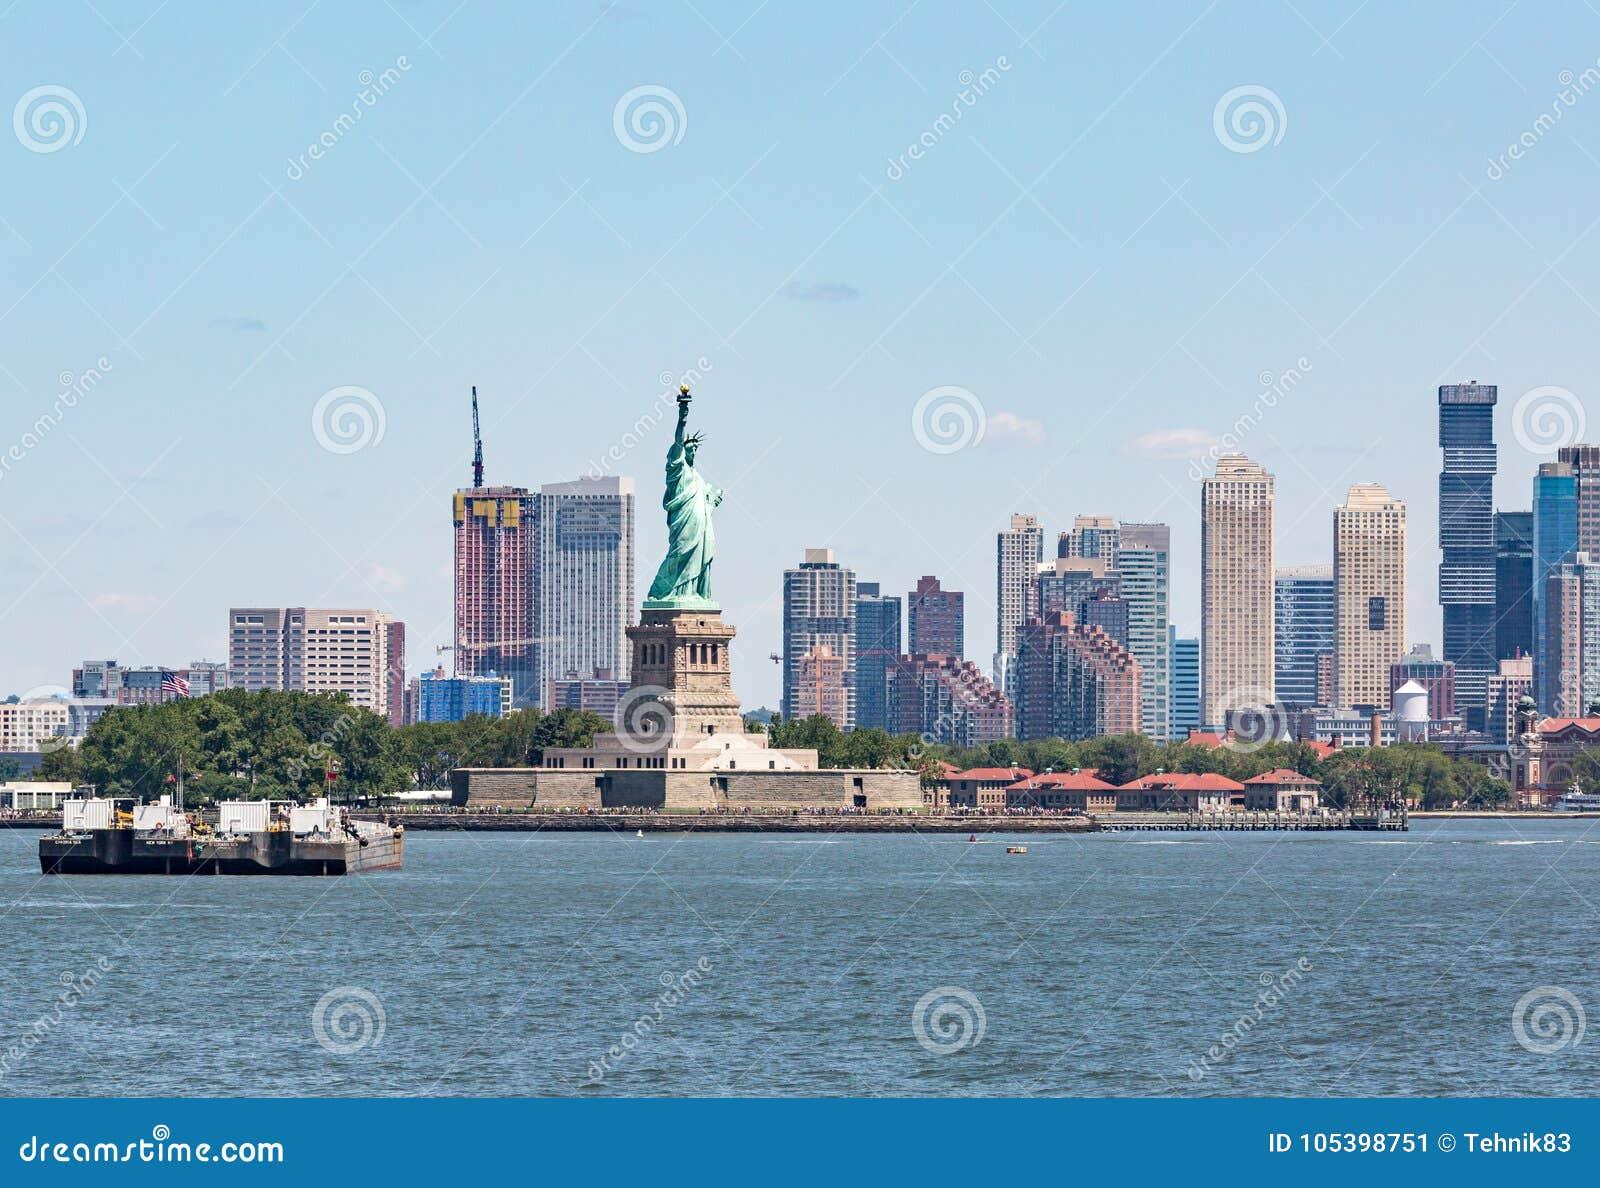 Statue of Liberty - July 09, 2017, Liberty Island, New York Harbor, NY, United States